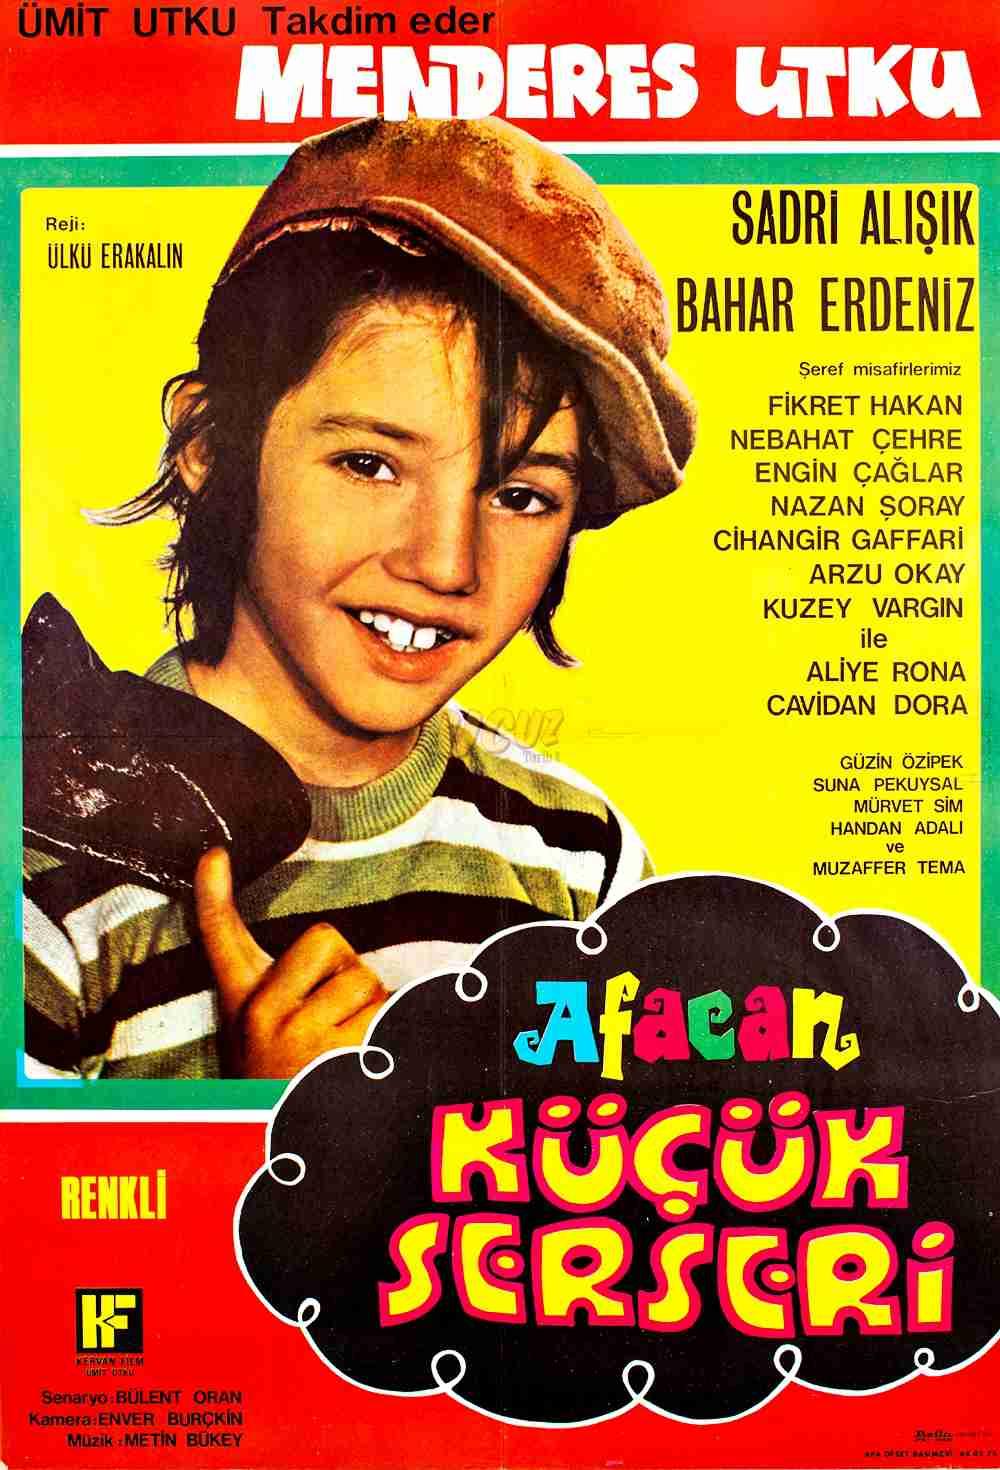 afacan_kucuk_serseri_1971-2